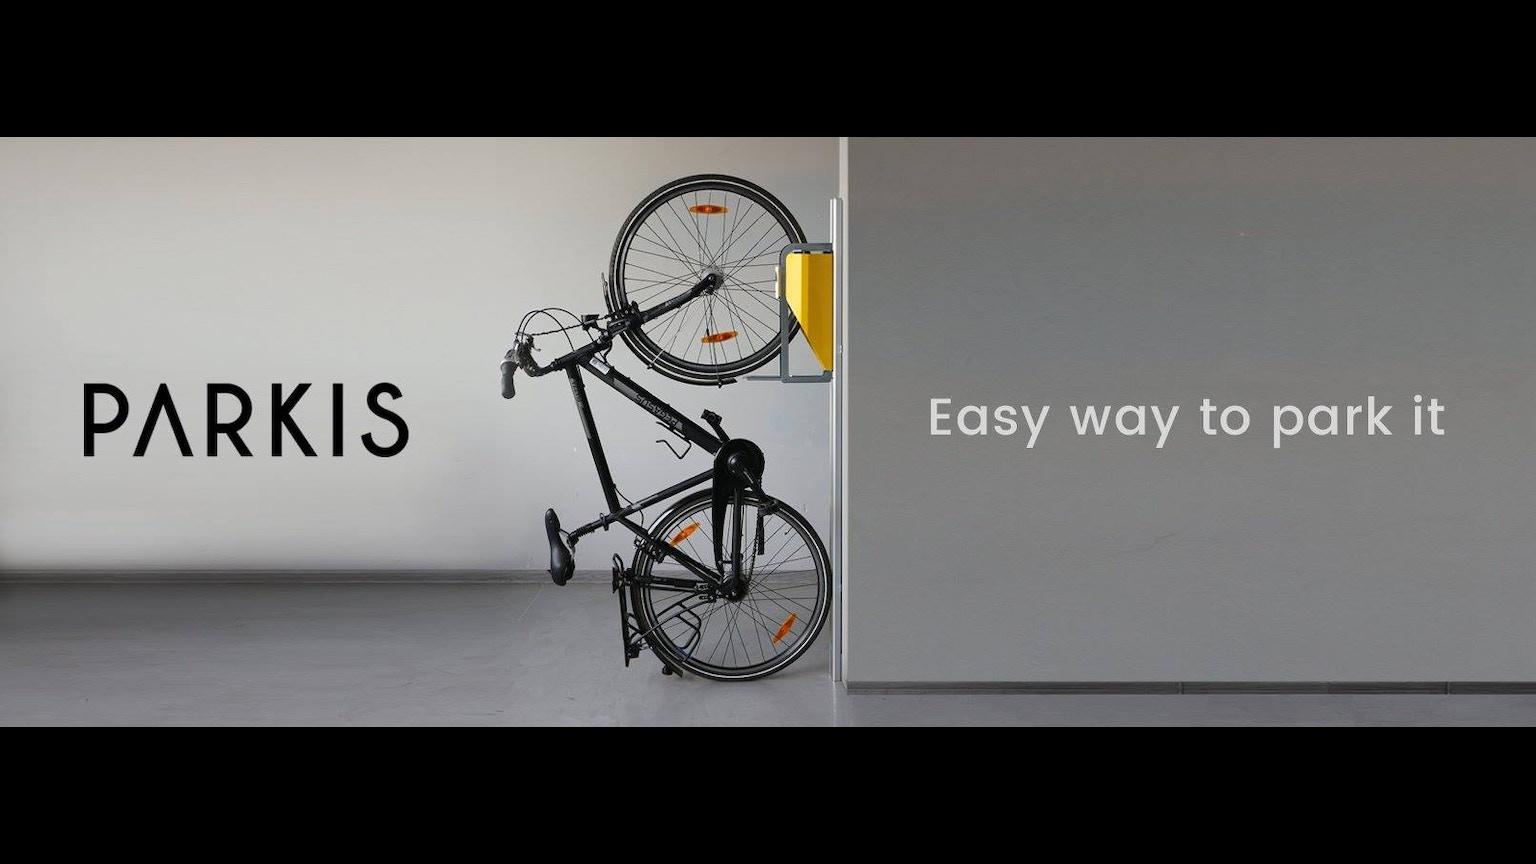 parkis space saving bicycle lift by giedre kickstarter. Black Bedroom Furniture Sets. Home Design Ideas